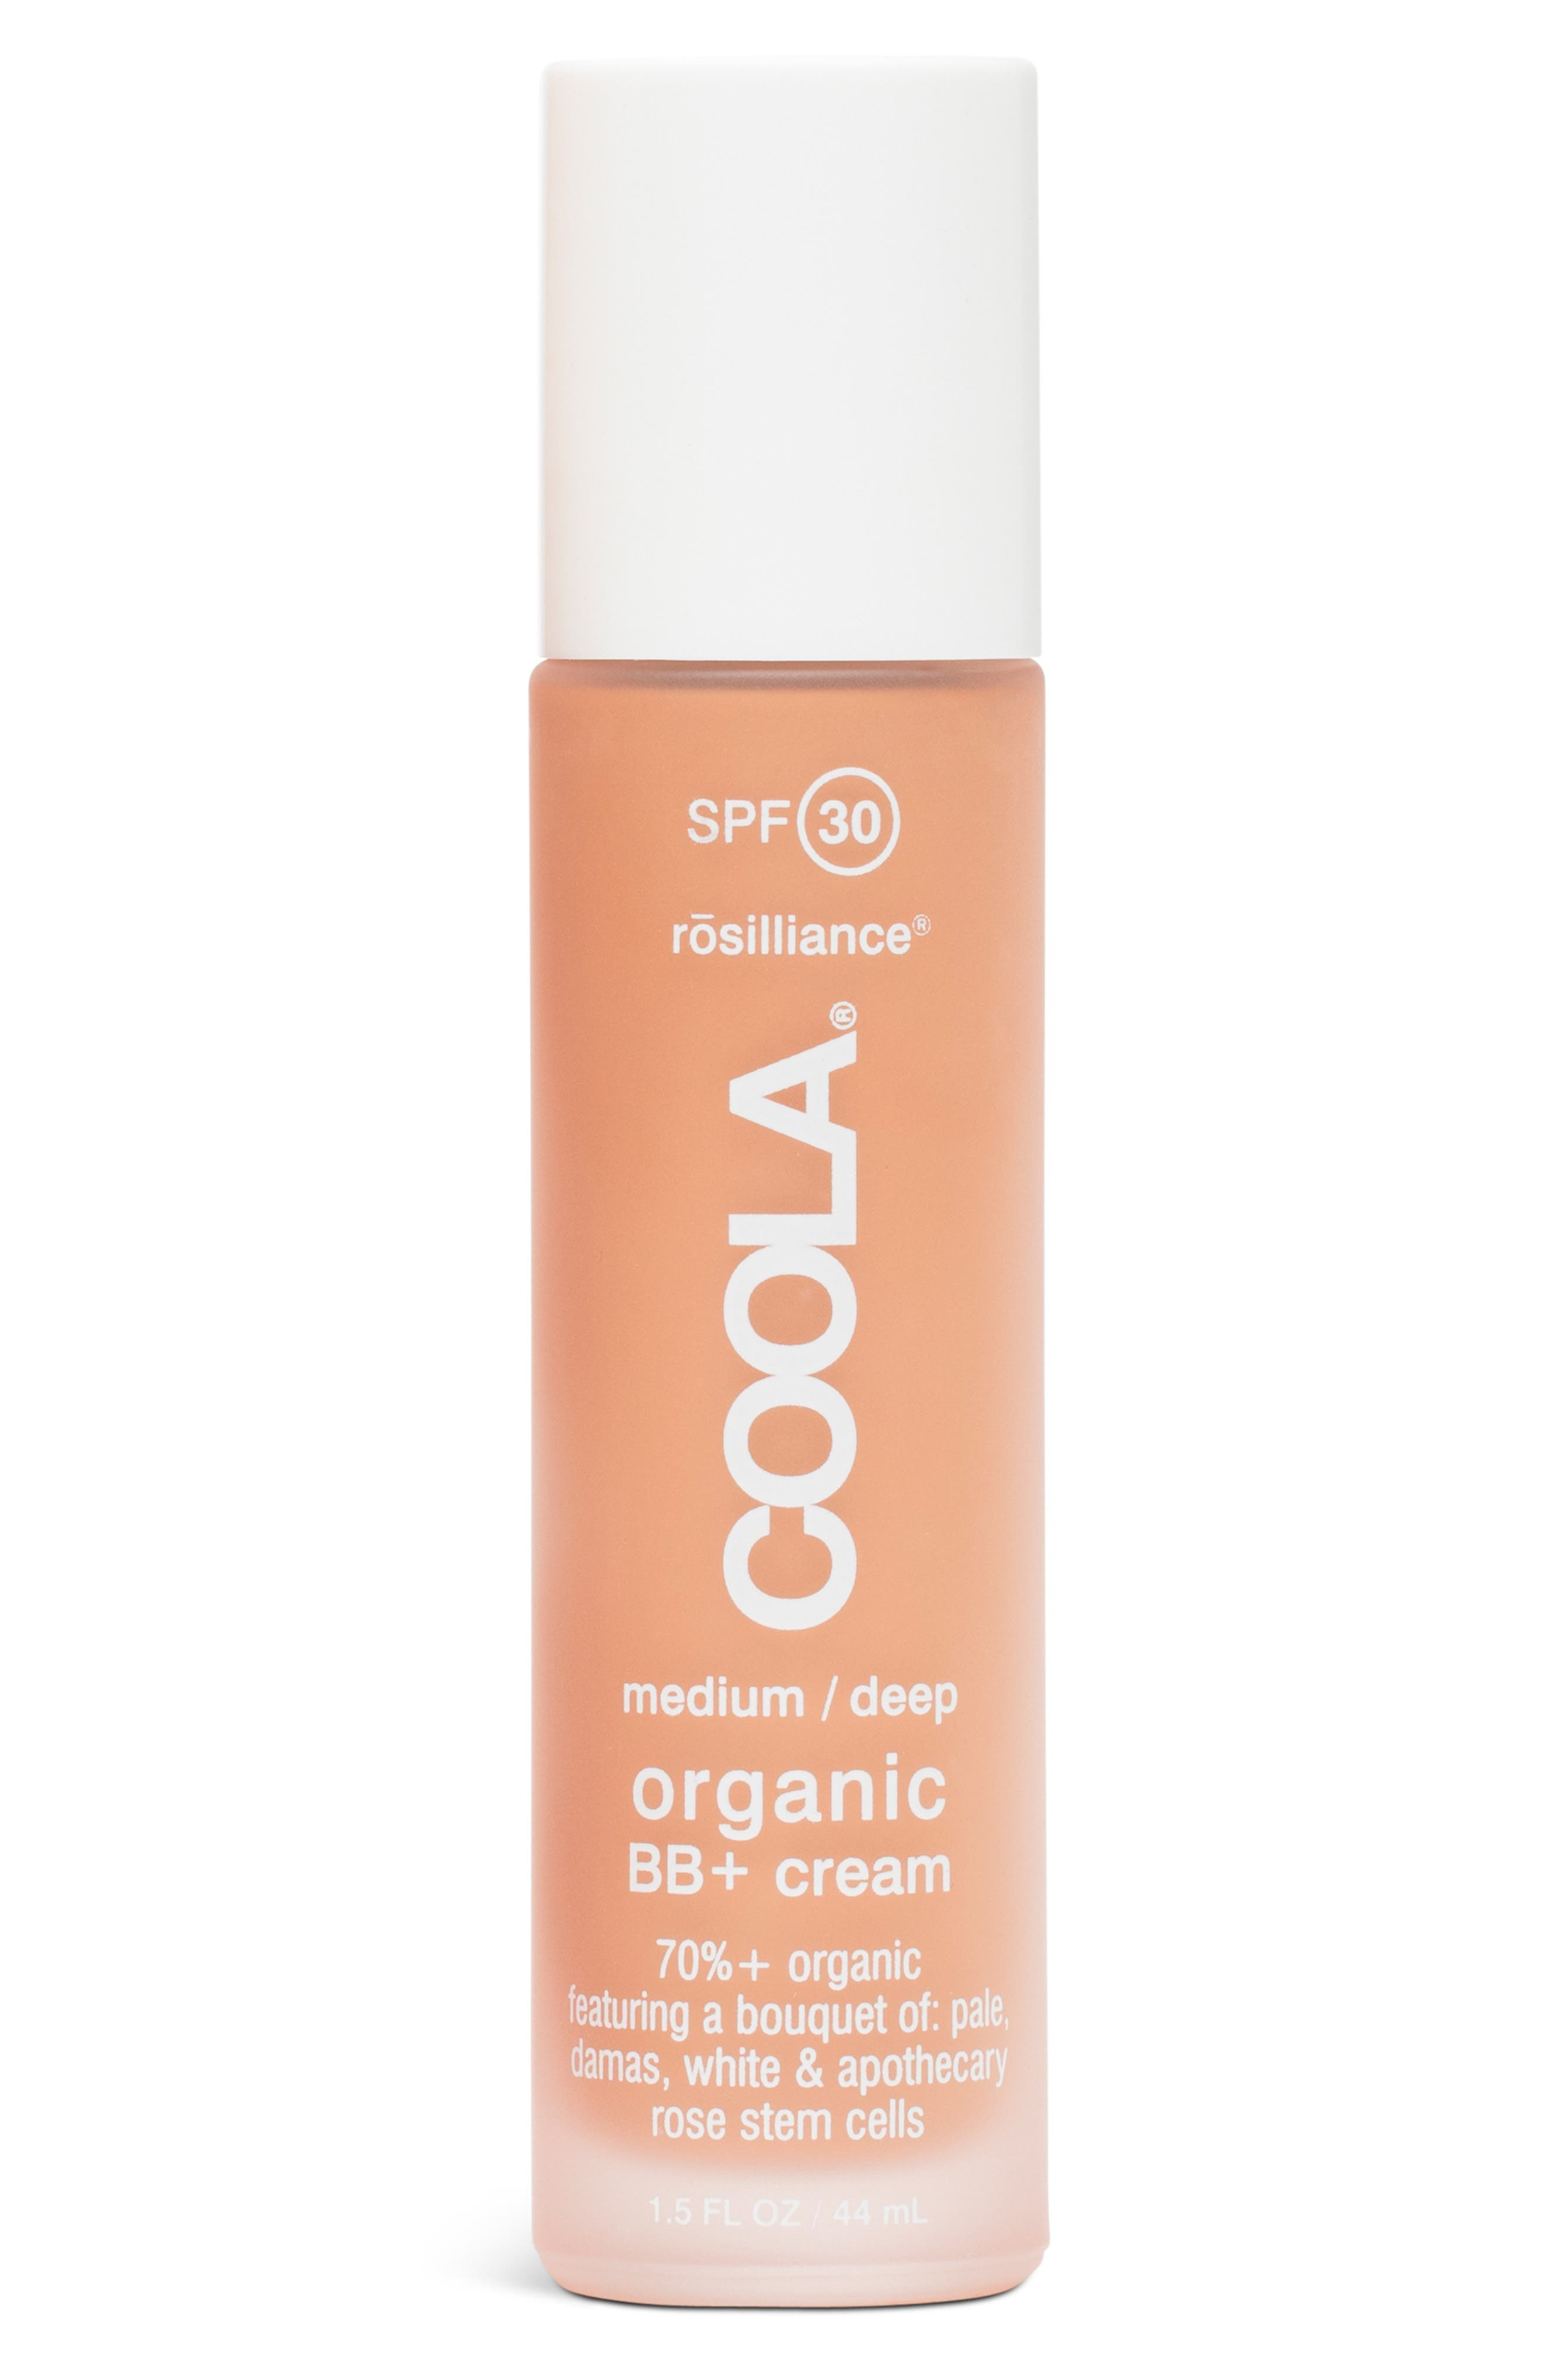 Suncare rosilliance™ Mineral BB+ Cream Tinted Organic Sunscreen SPF 30 | Nordstrom